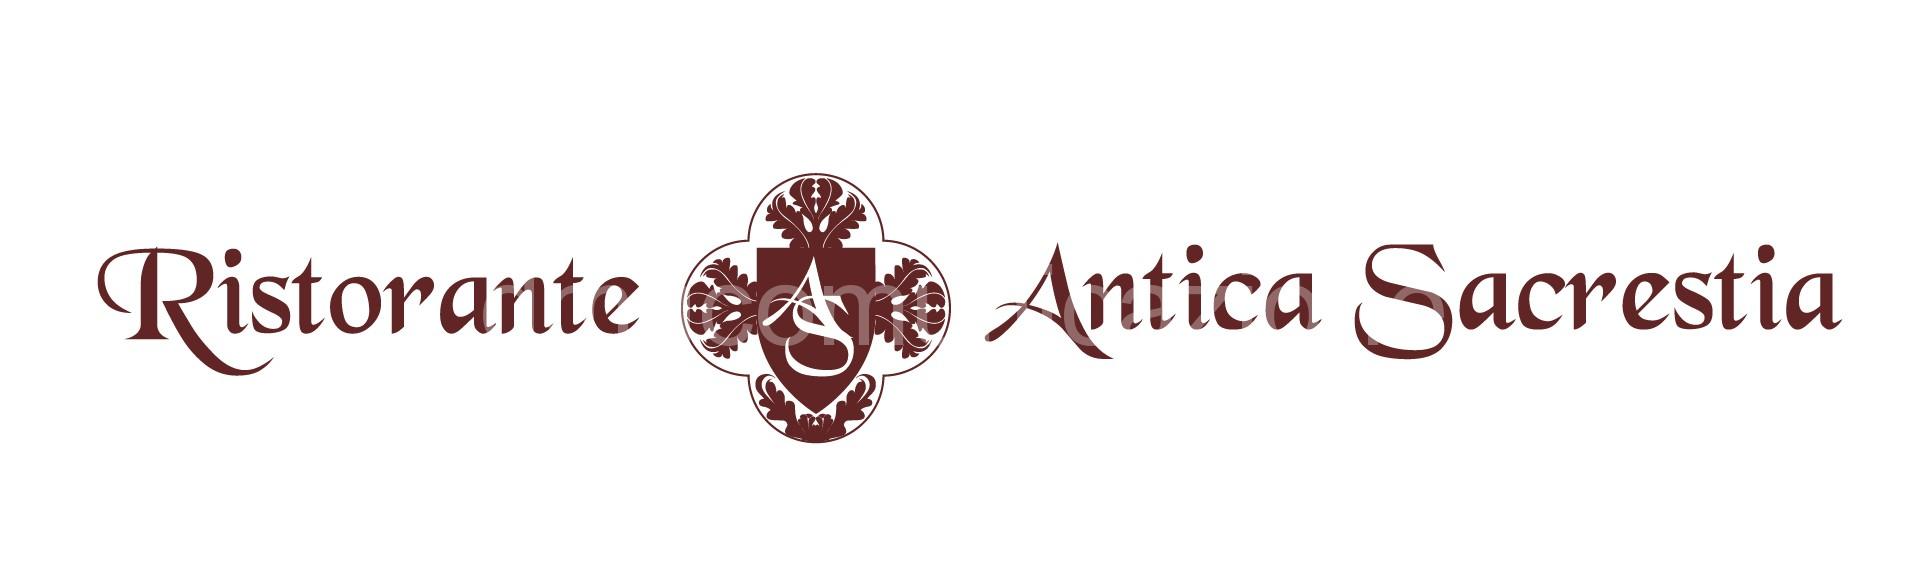 ANTICA_SACRESTIA_OK_TRK-02